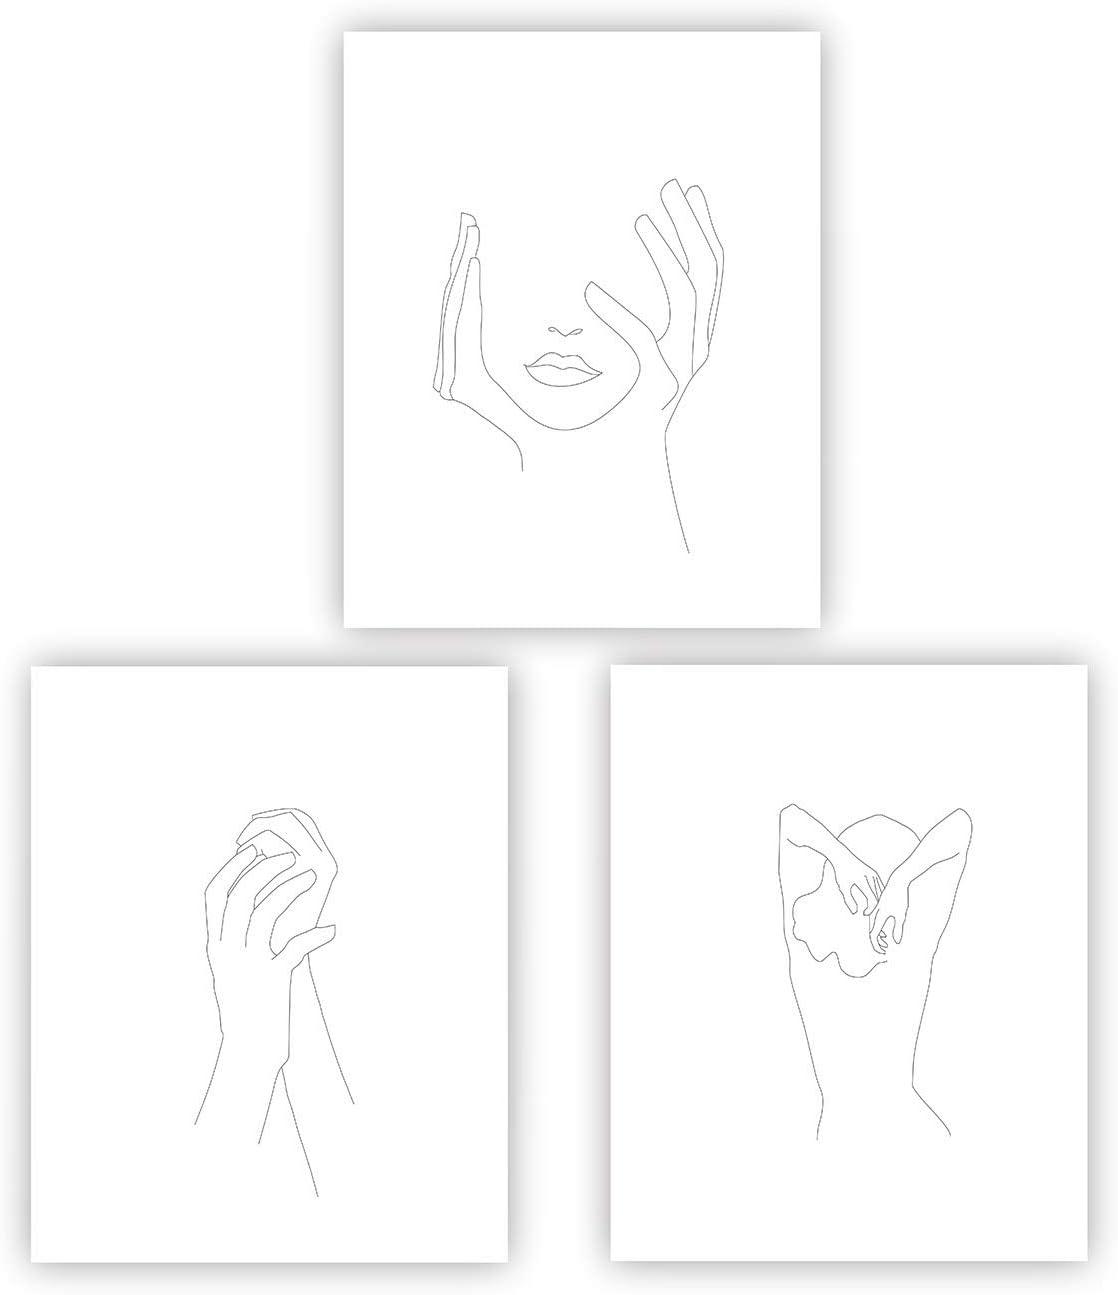 Hands On Face Feminine Hands Print Poster Black And White Sketch Art Line Drawing Decor Minimal Art Simple Fashion Woman Art Living Room Bedroom Home Decor (UNFRAMED)